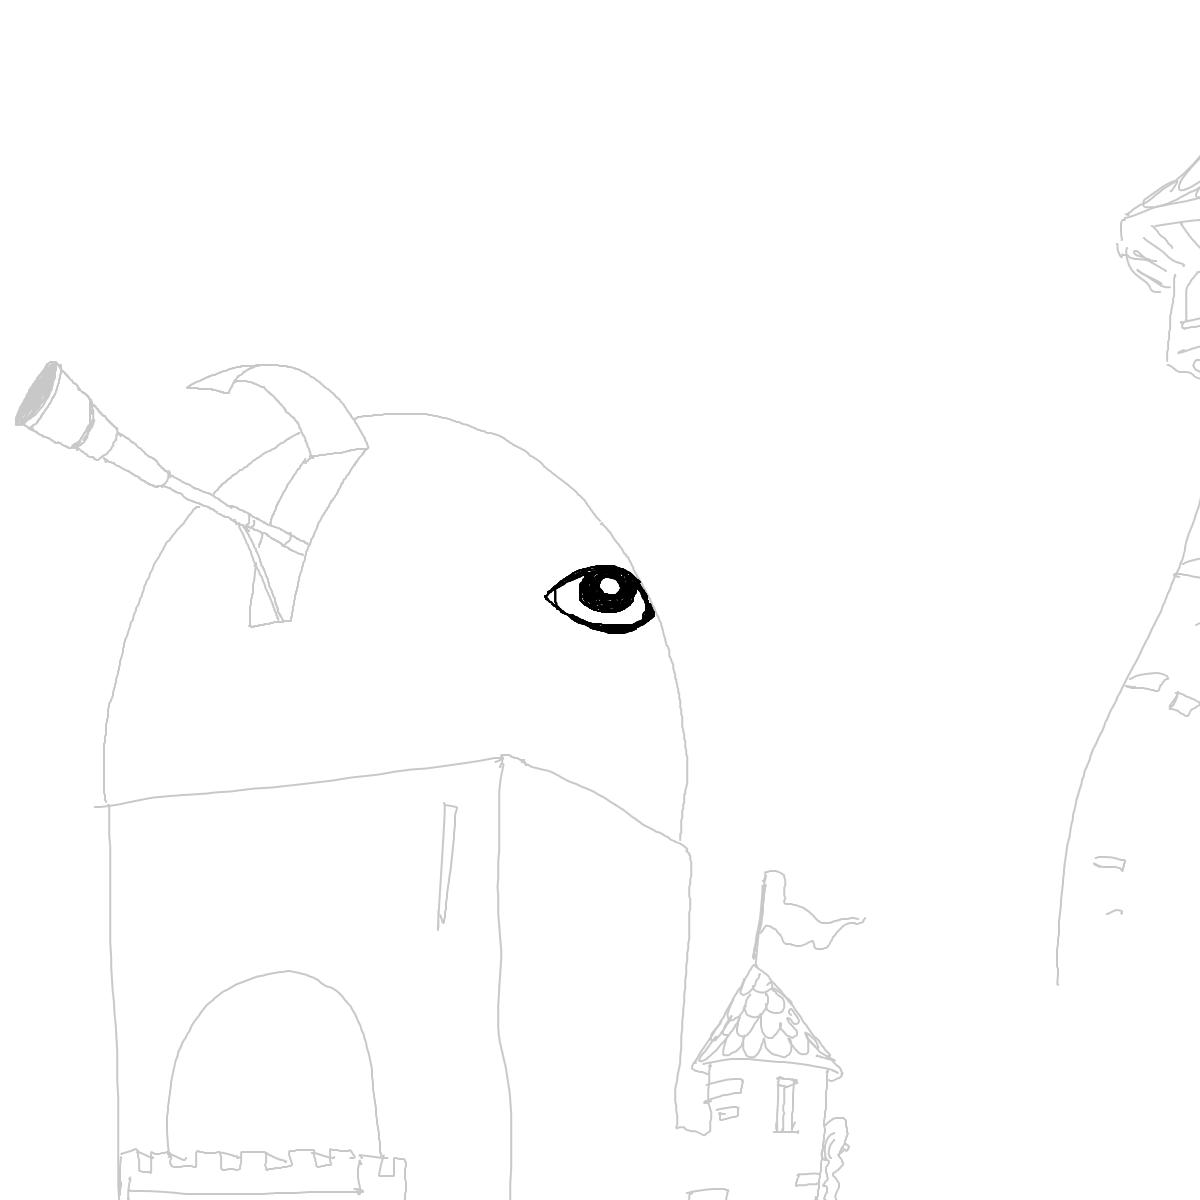 BAAAM drawing#3787 lat:78.4176025390625000lng: -4.4395356178283690